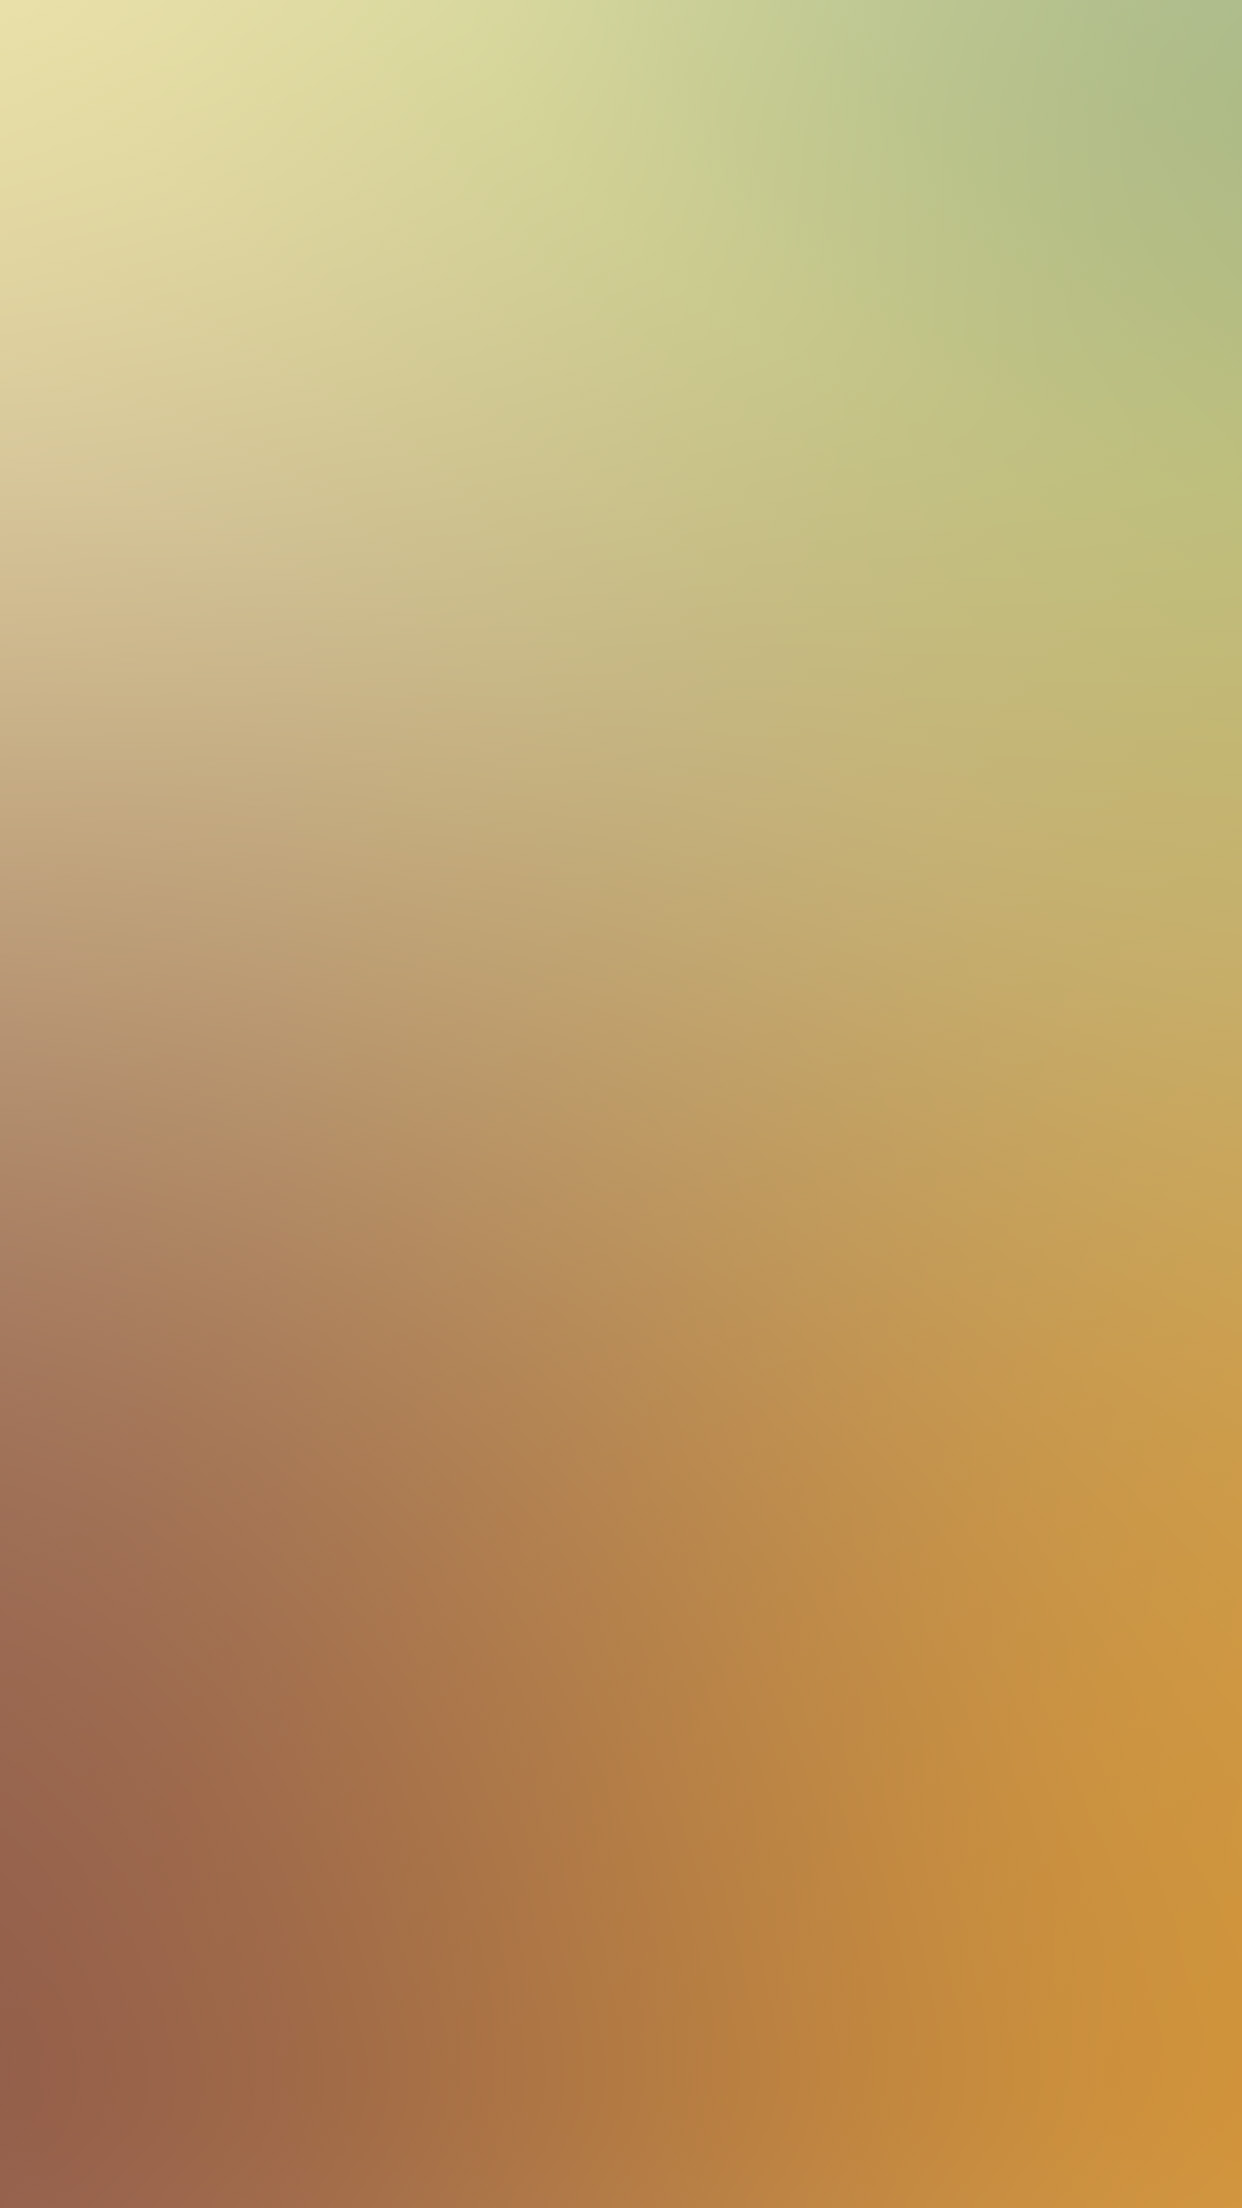 papers.co sk02 yellow orange soft blur gradation 34 iphone6 plus wallpaper